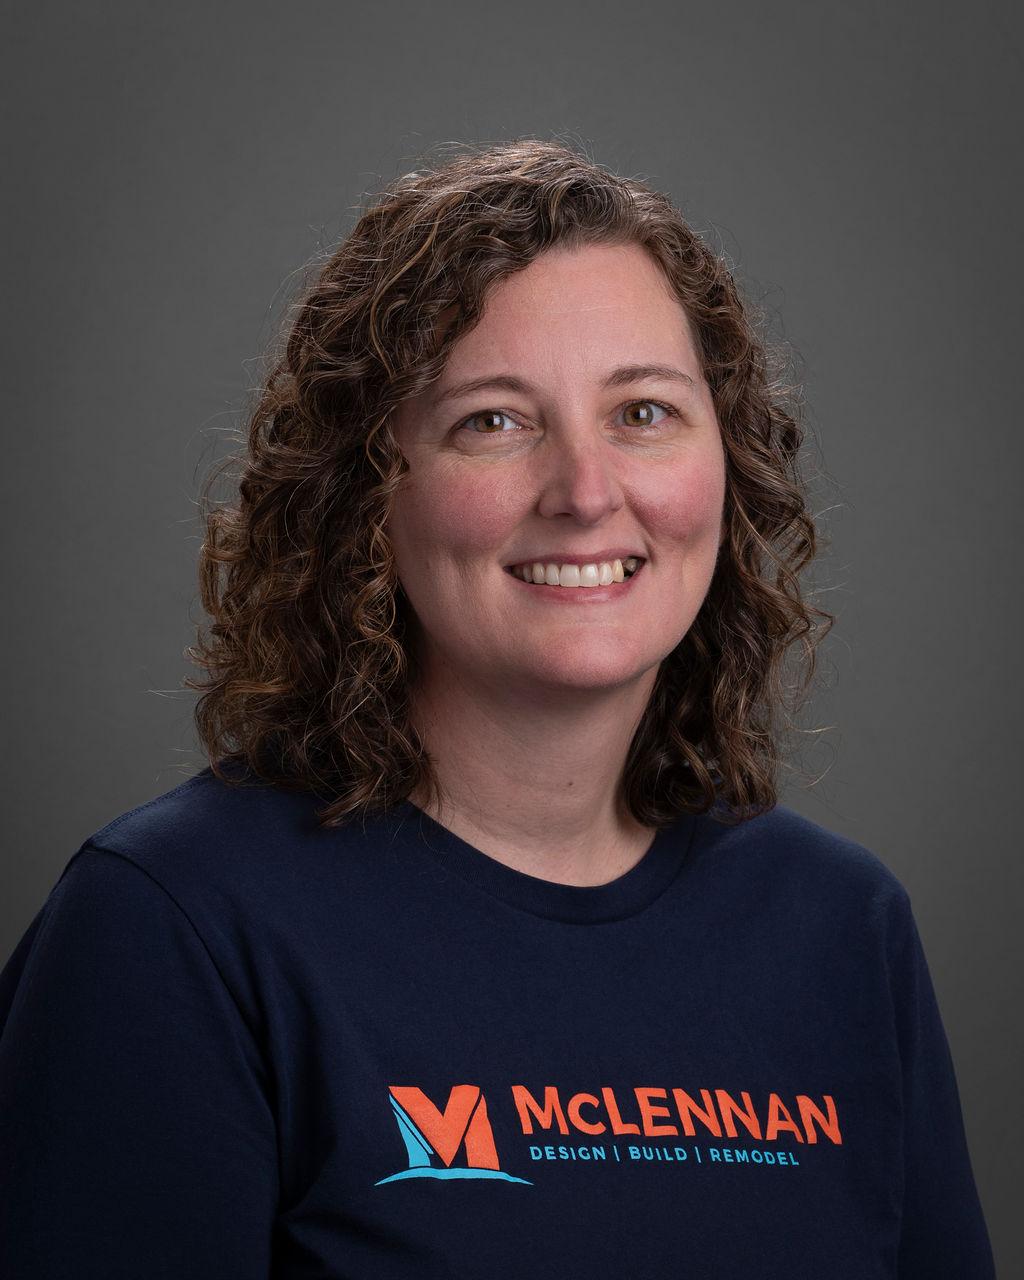 Photo of Alison McLennan